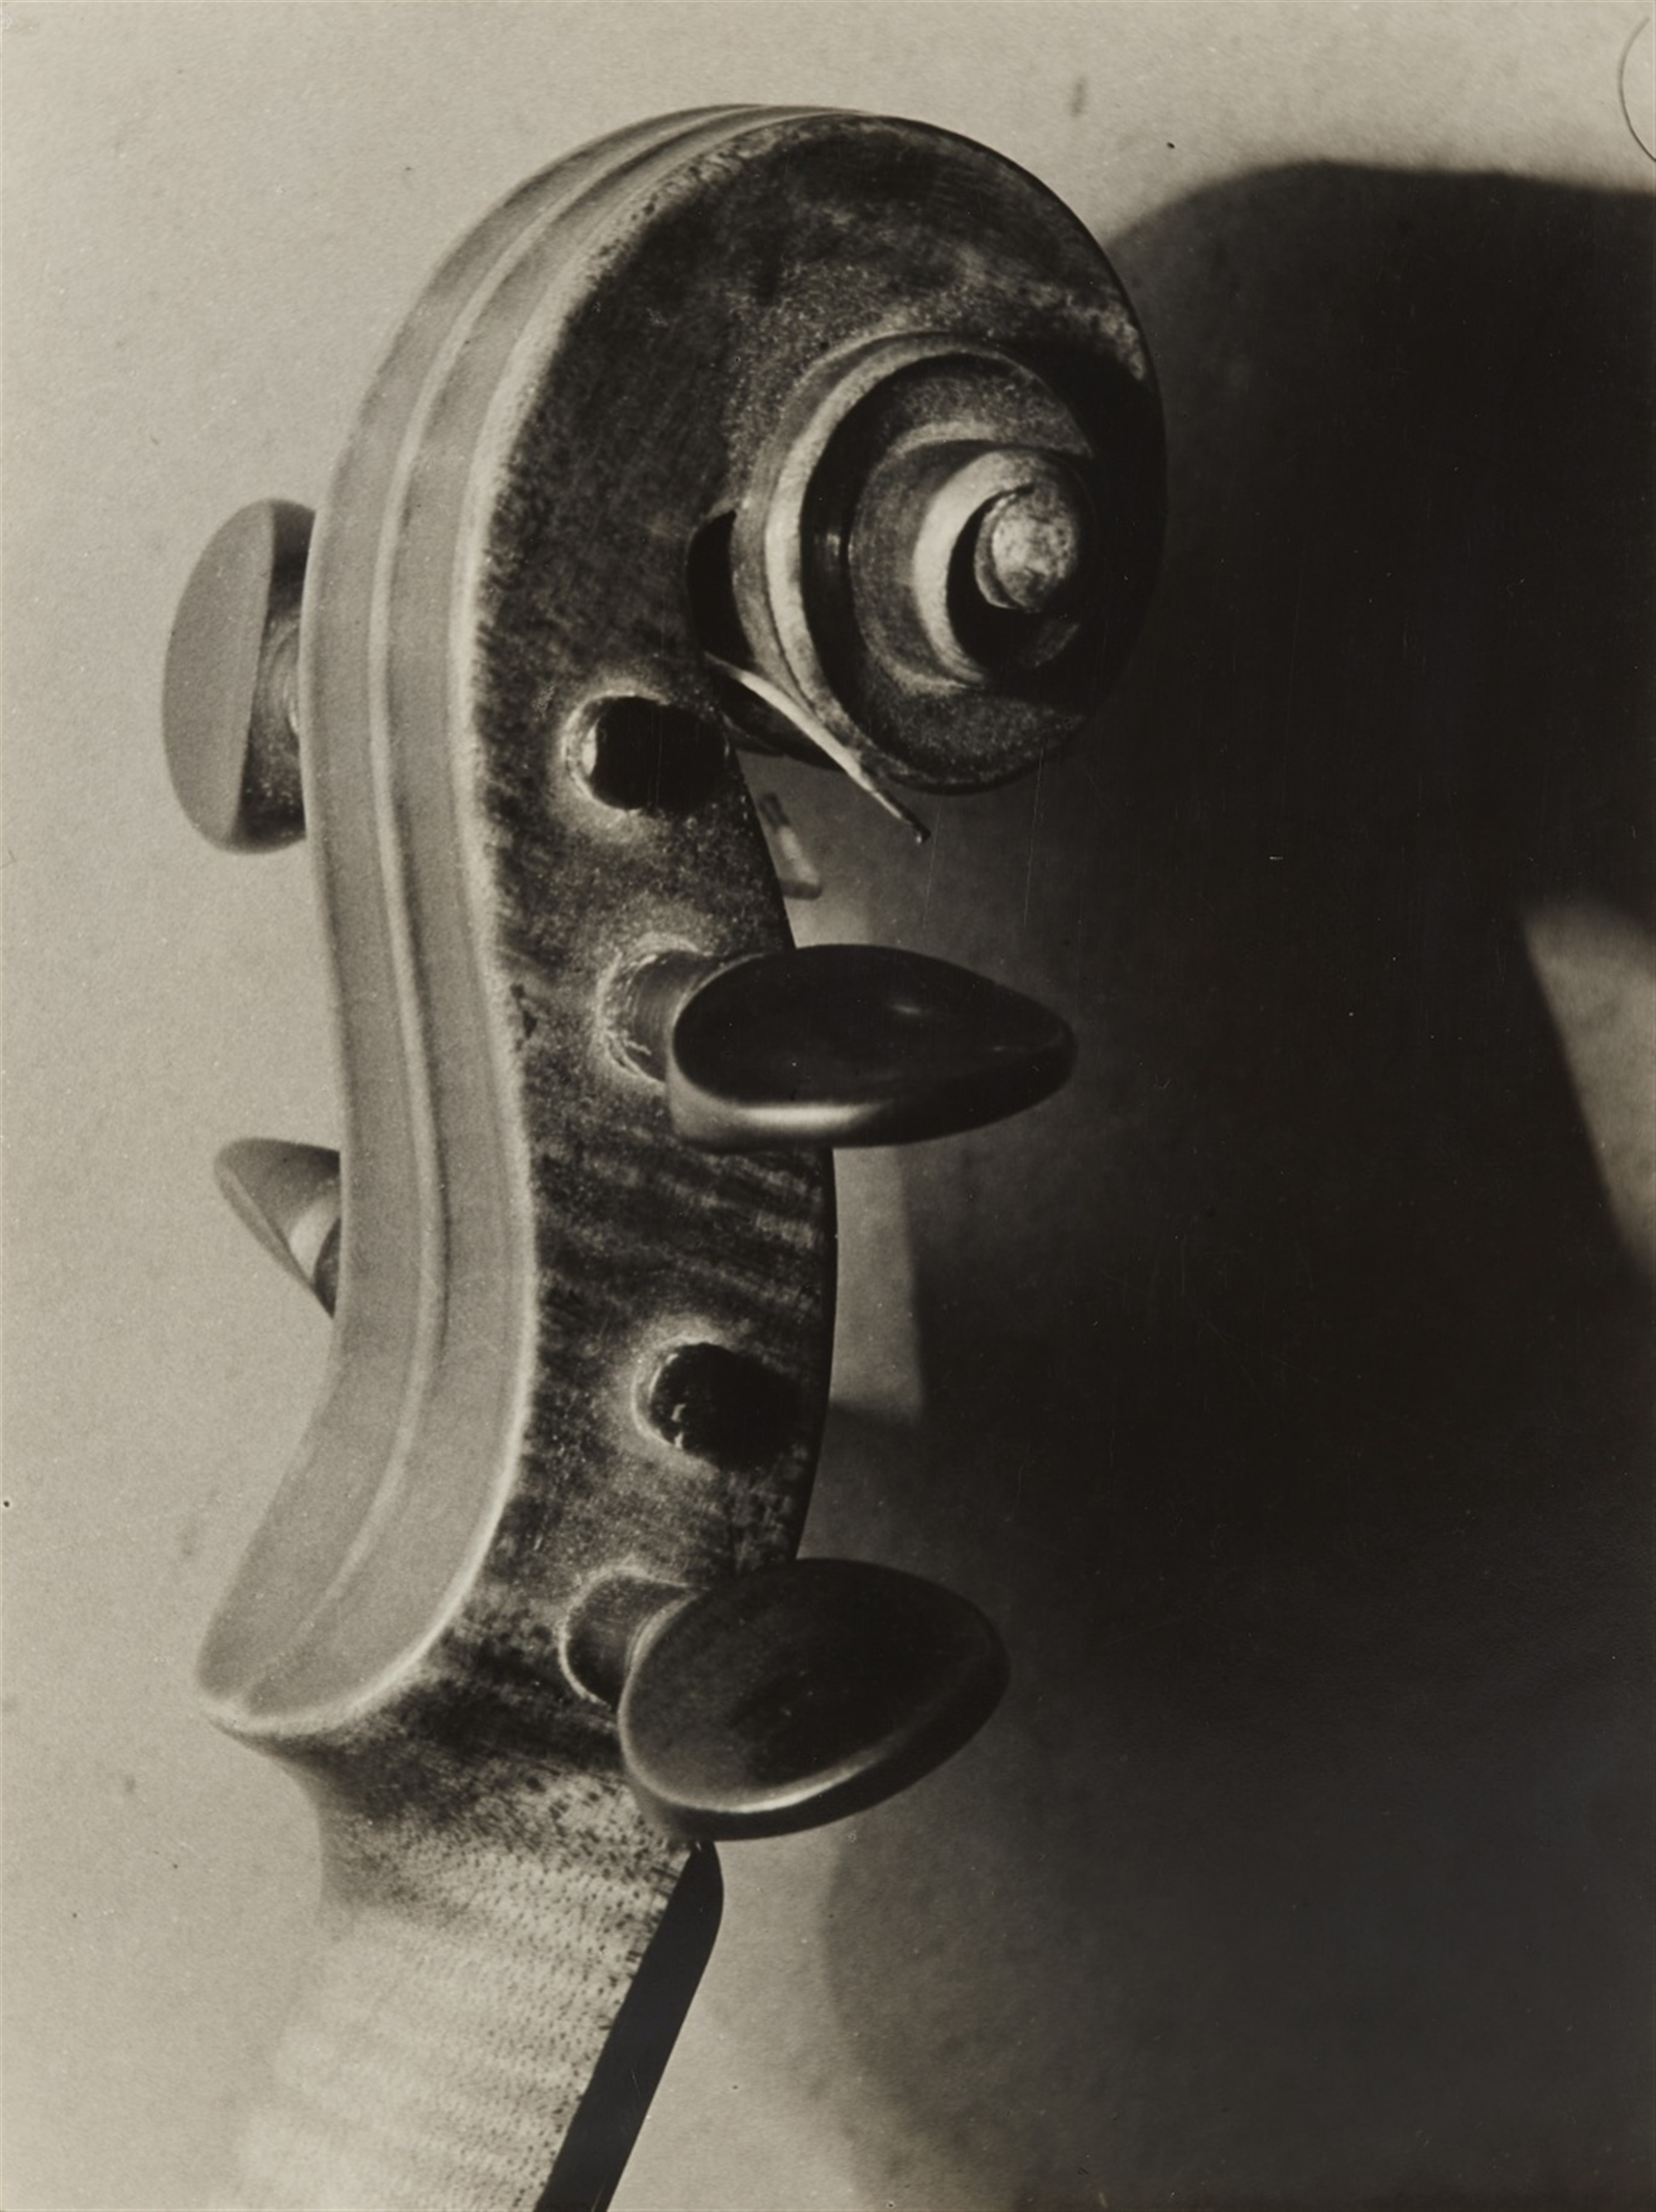 Ladislav Foltyn (Ladislaus Fuszmann)<BR>Untitled (Scroll of a violin)